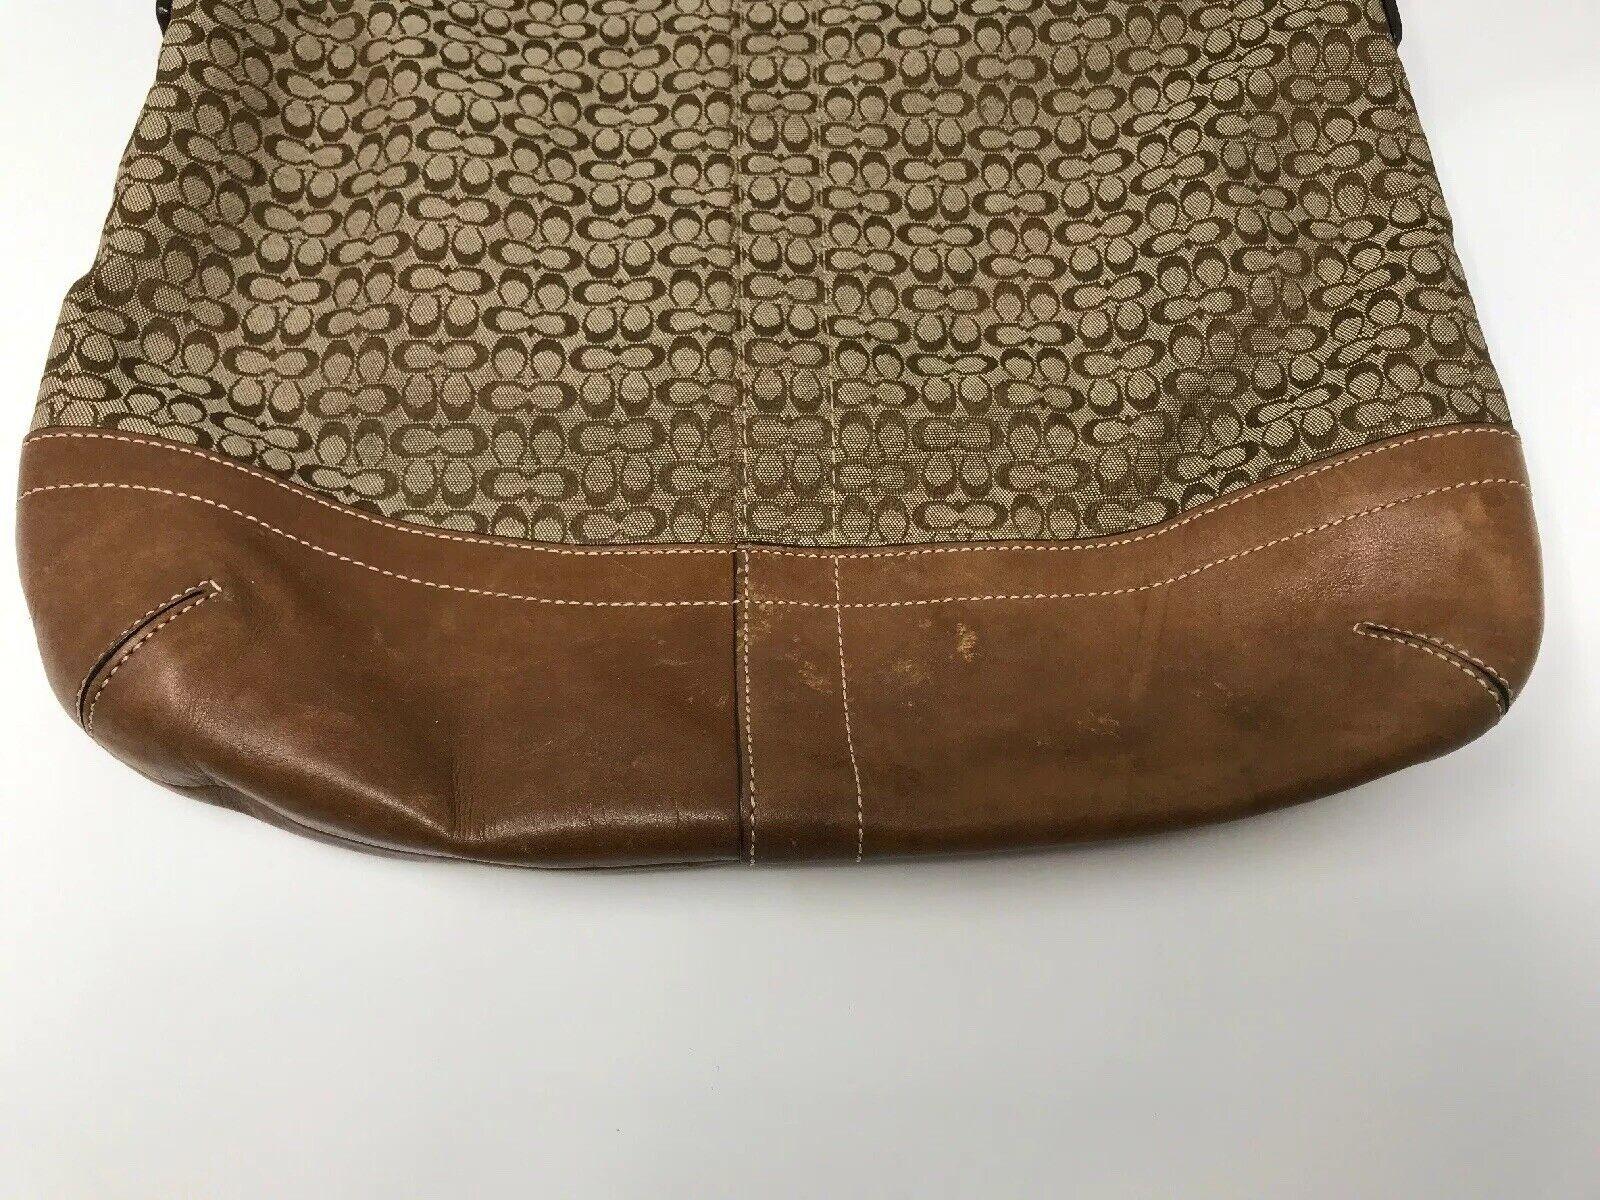 Coach Monogram Canvas Tan Crossbody/Shoulder Bag - image 3